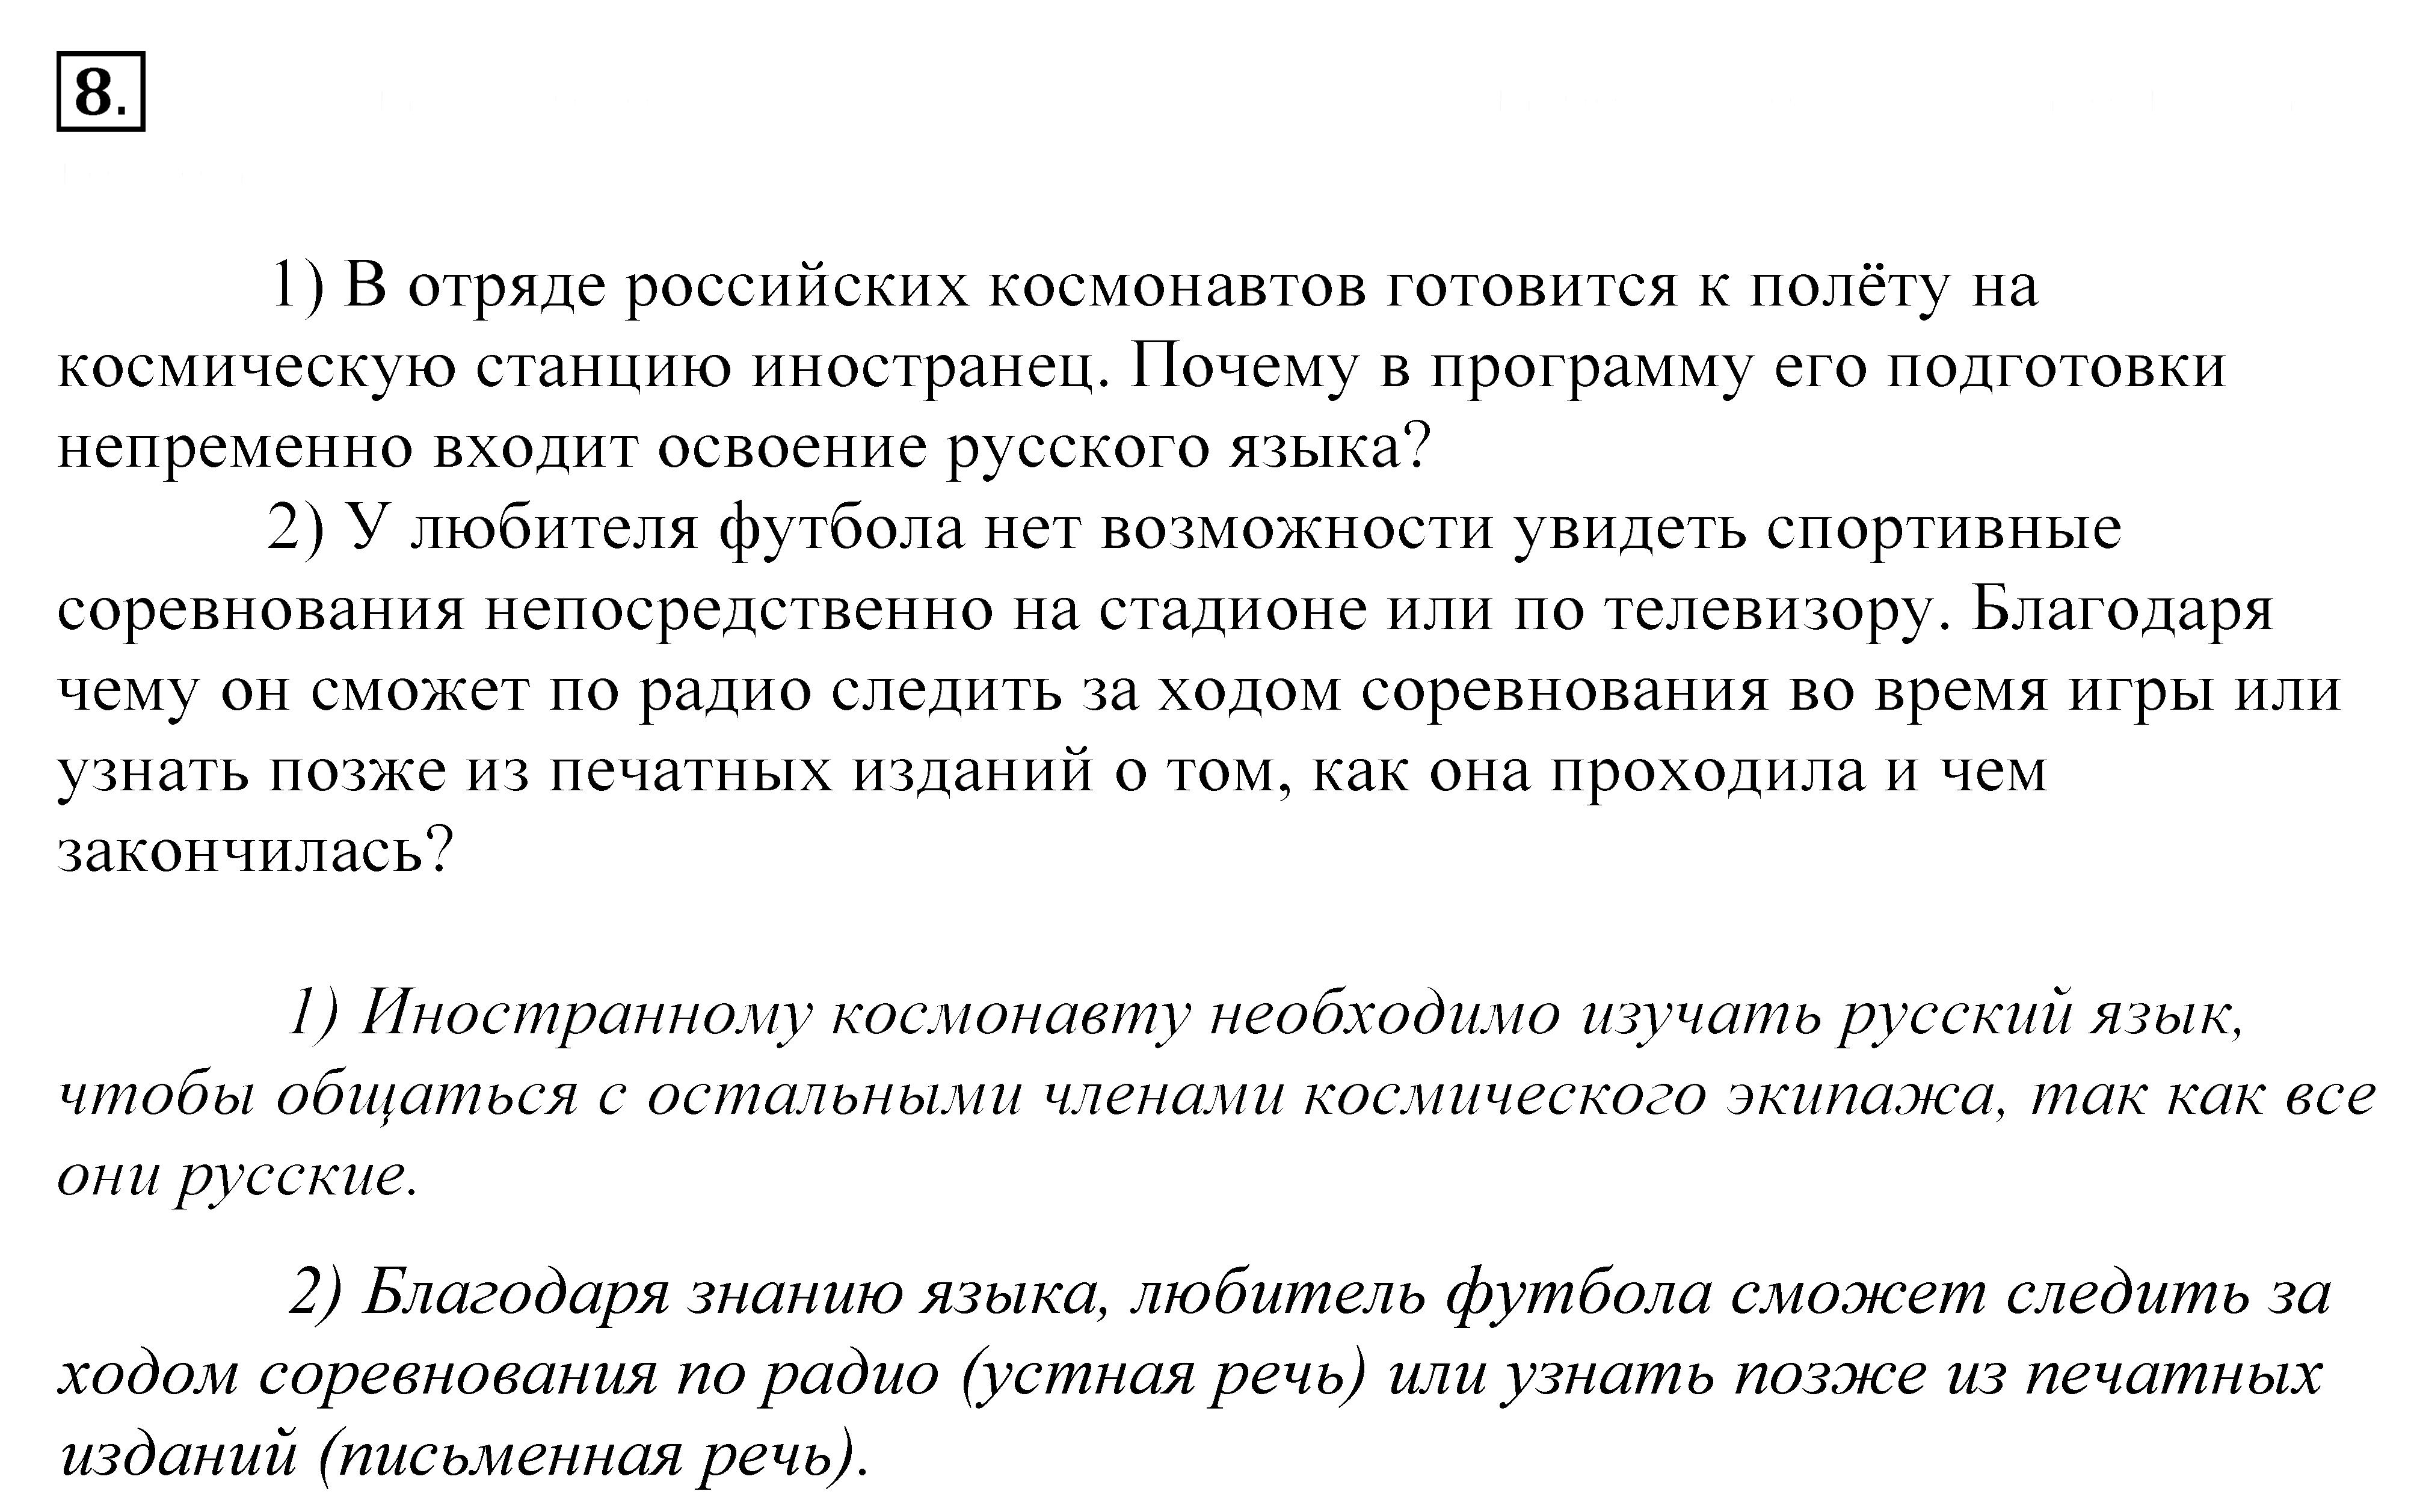 Домашняя работа по русскому языку 5 класс автор купалова еремеева пахнова